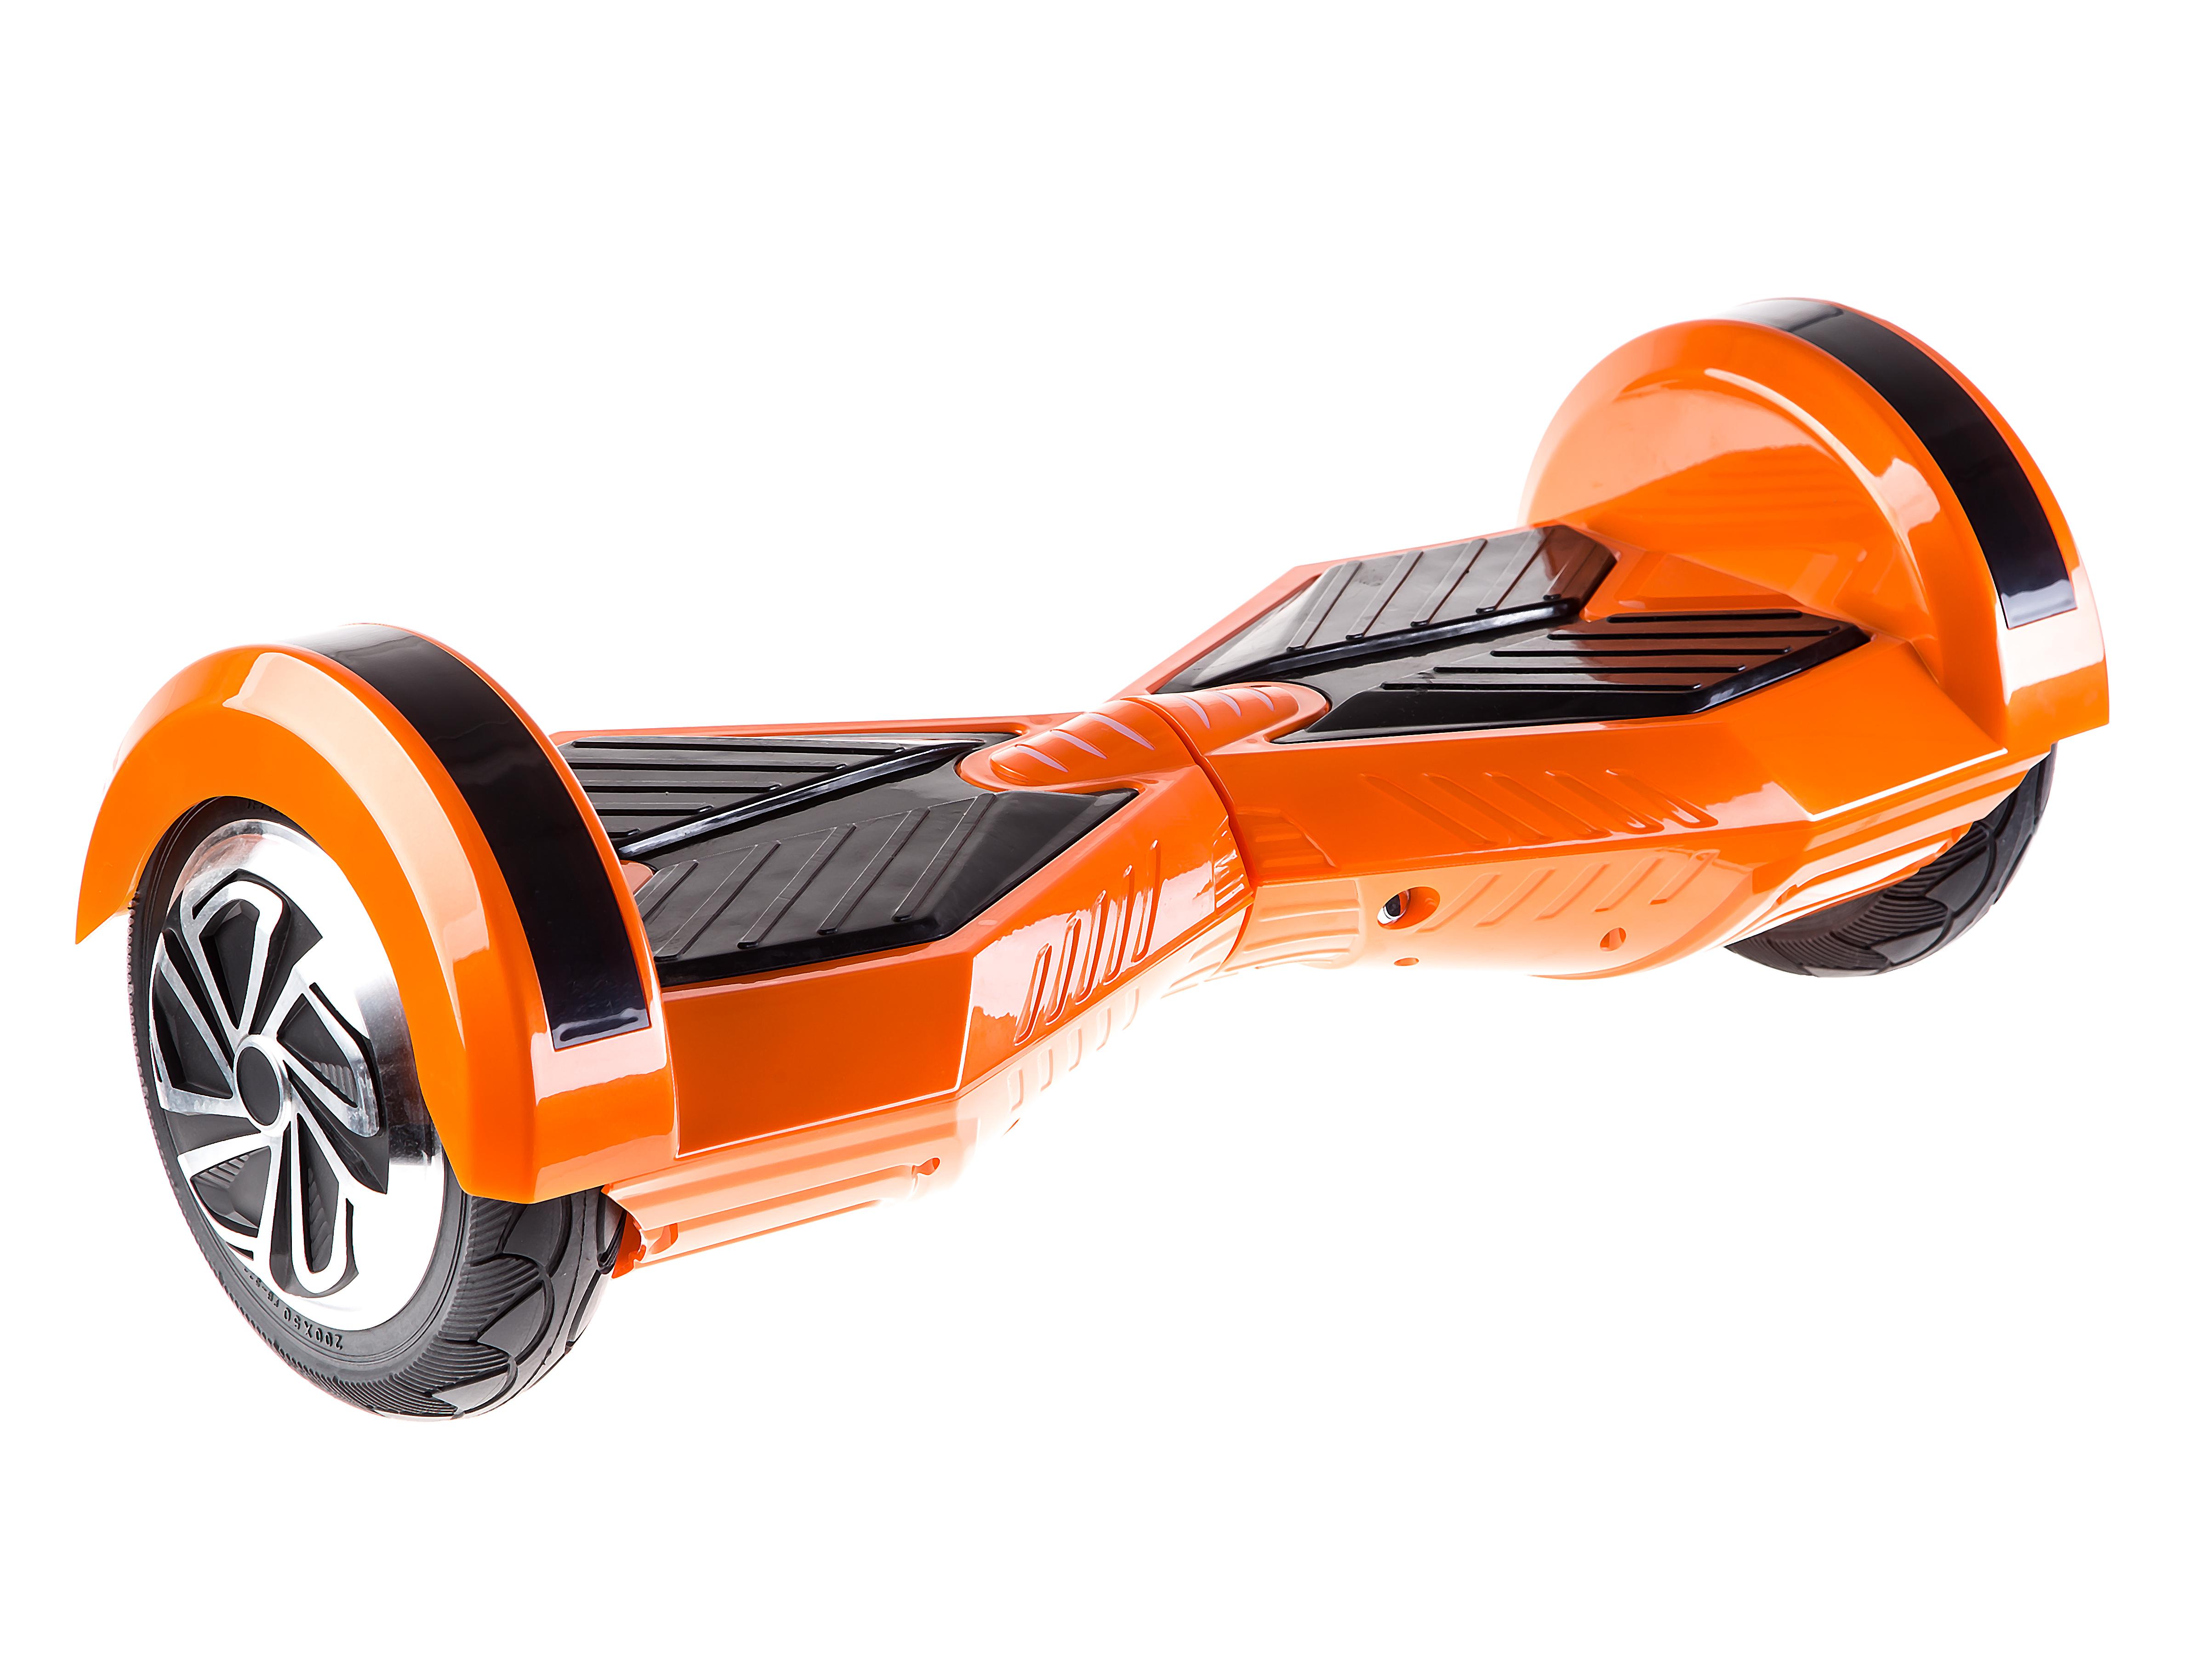 все цены на Гироскутер Superbsail Slx-004/8 оранжевый онлайн